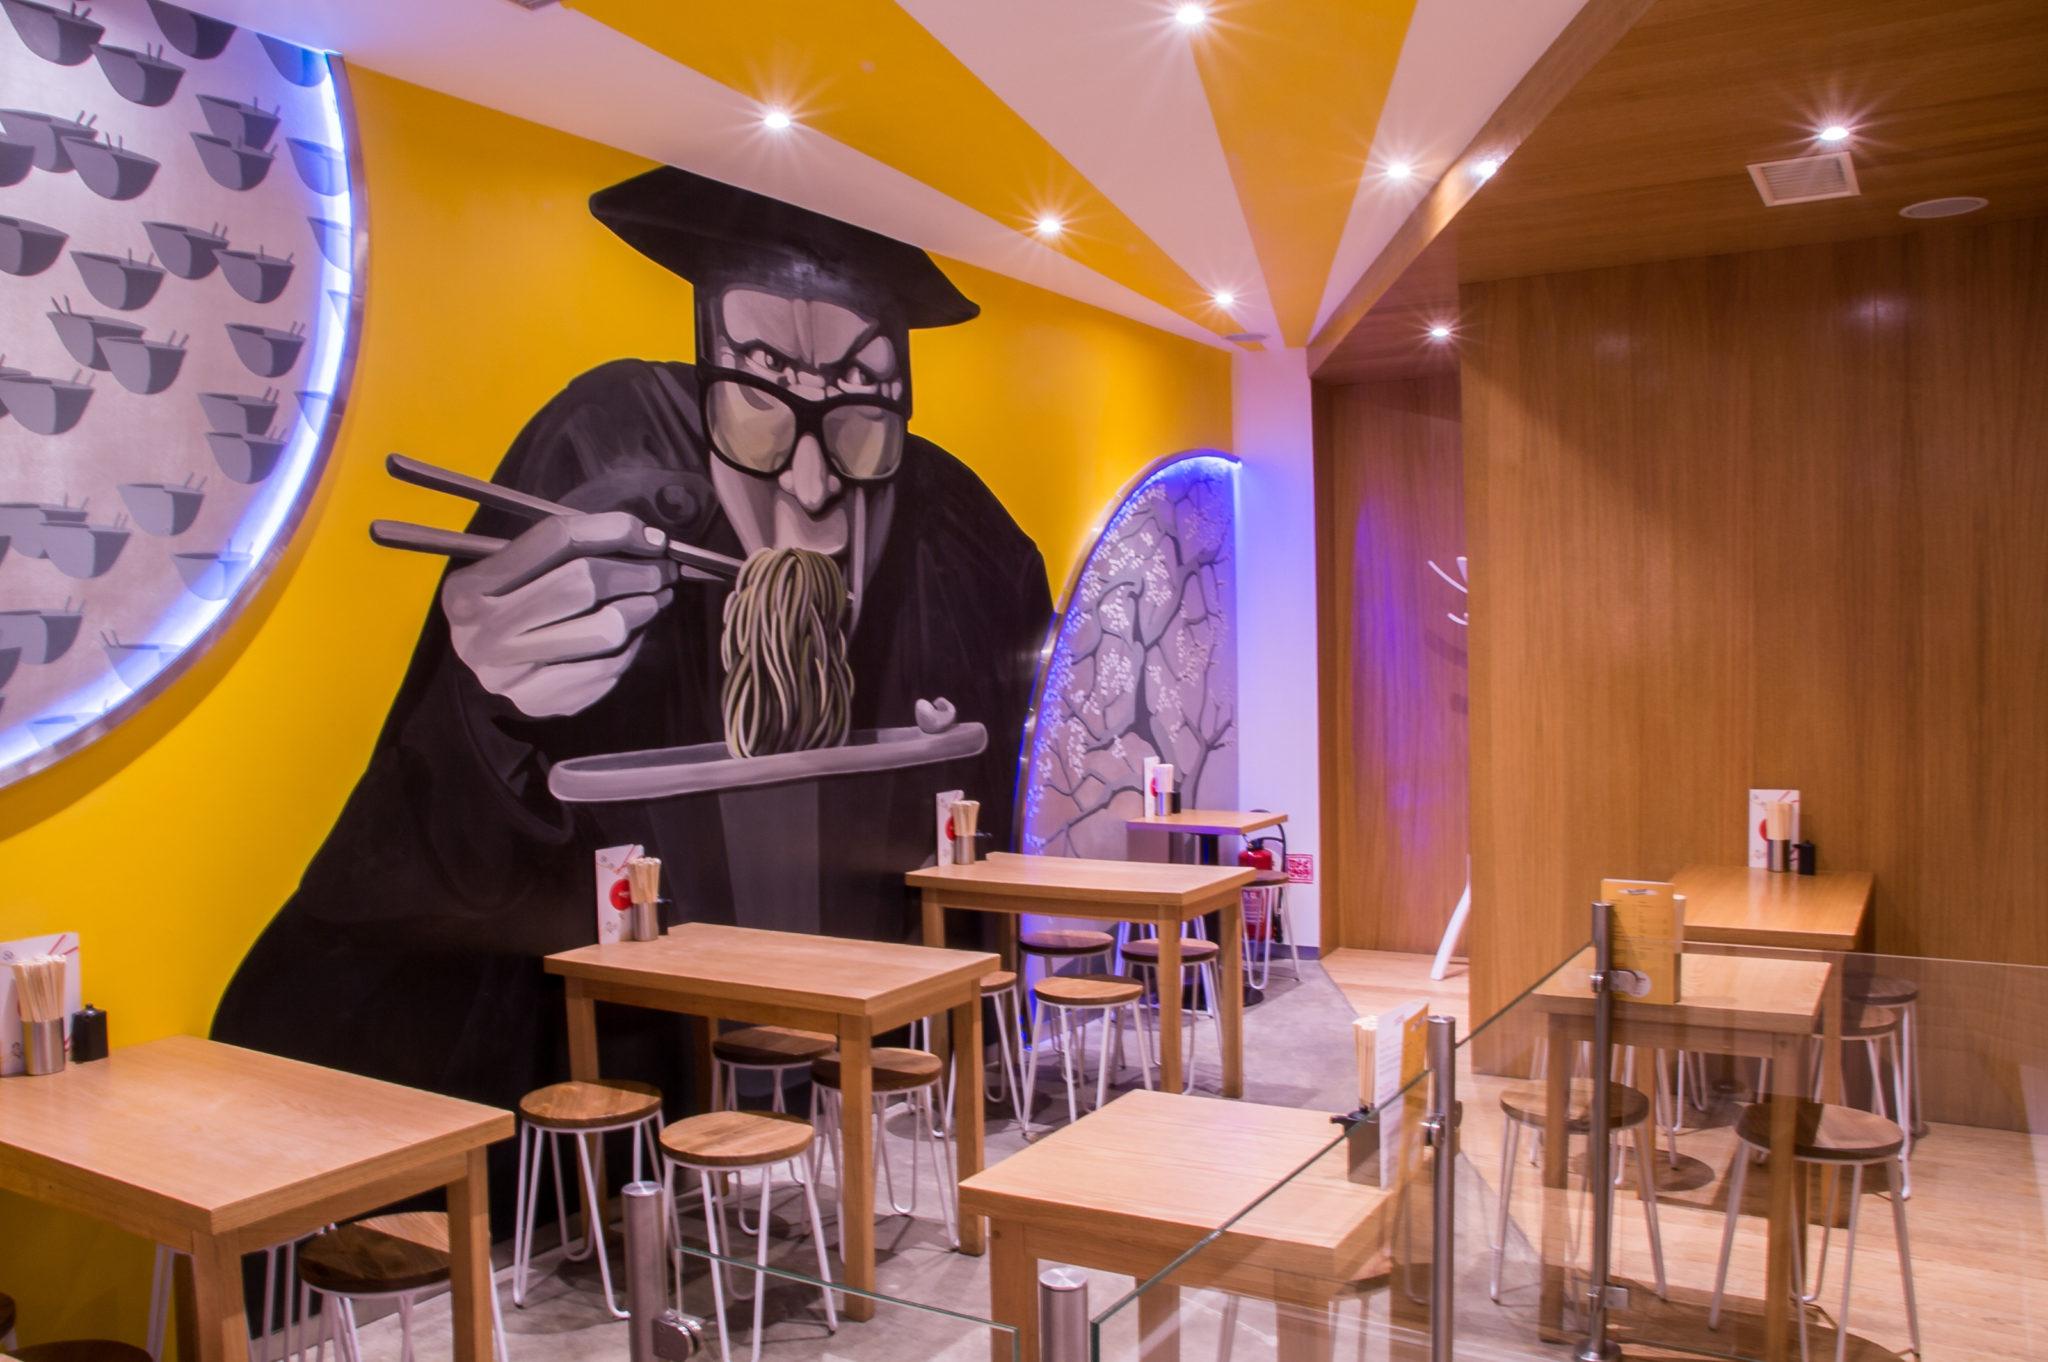 Ramen Bowl cantine street food japonaise Paris restaurant oji streetart 02